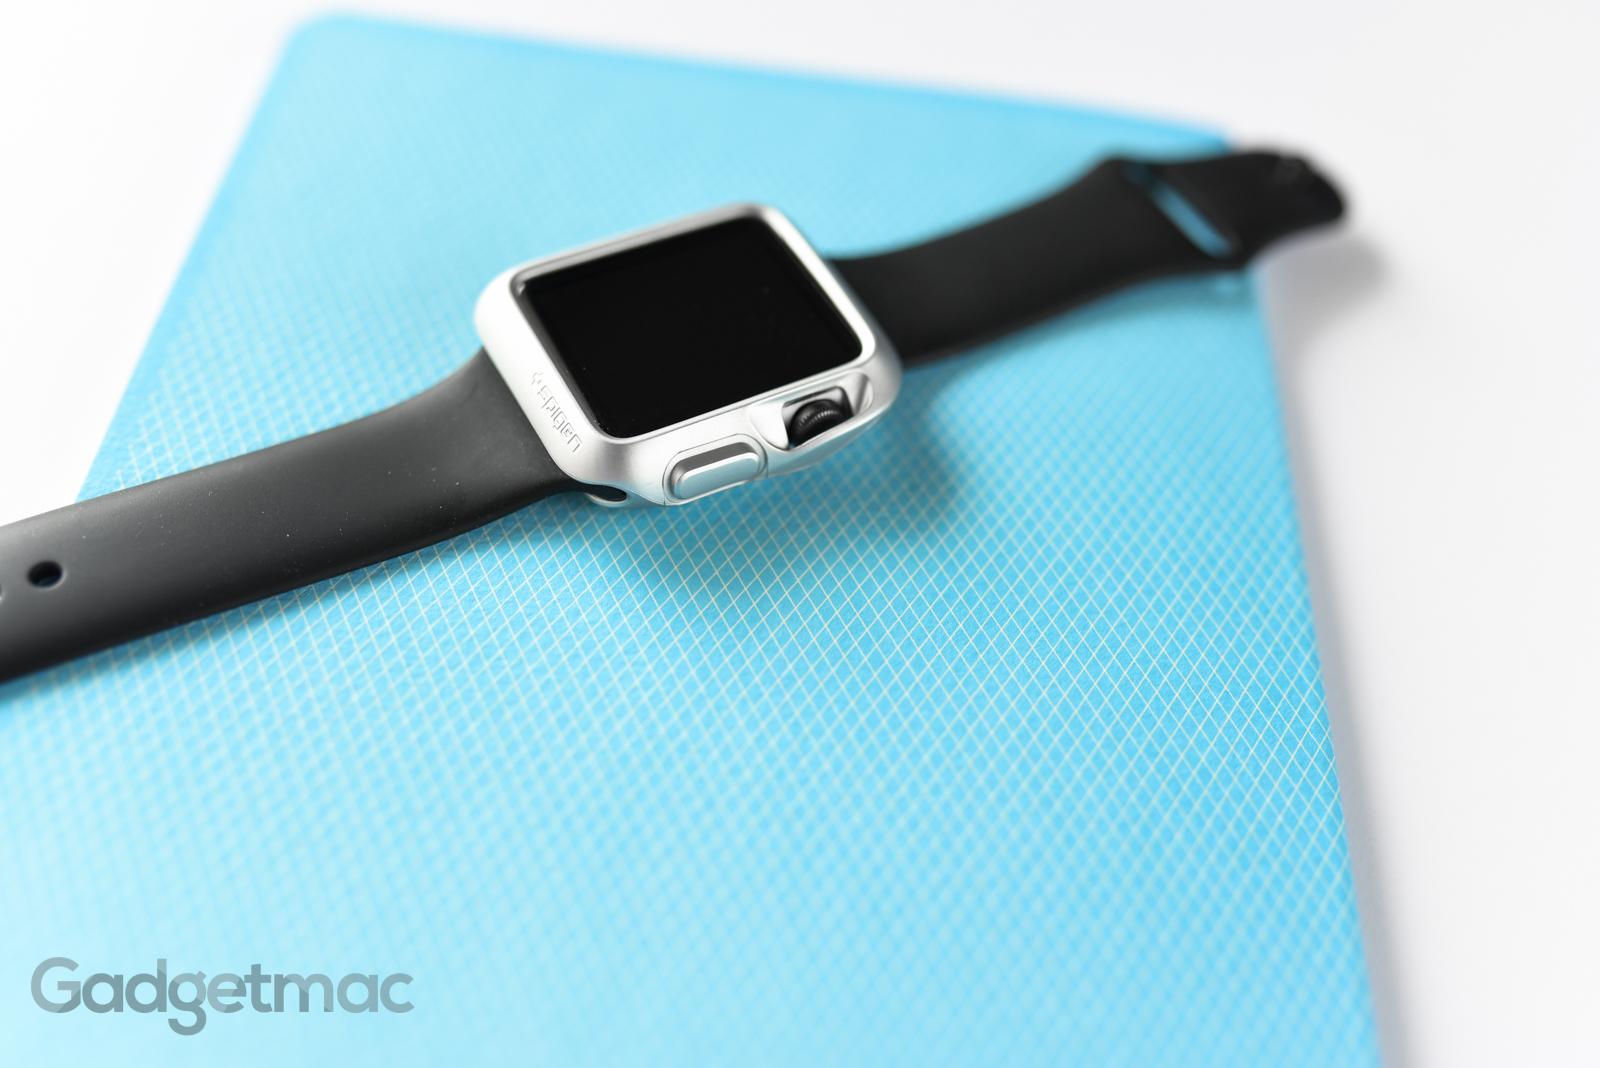 spigen-slim-armor-silver-case-for-apple-watch-digital-crown.jpg